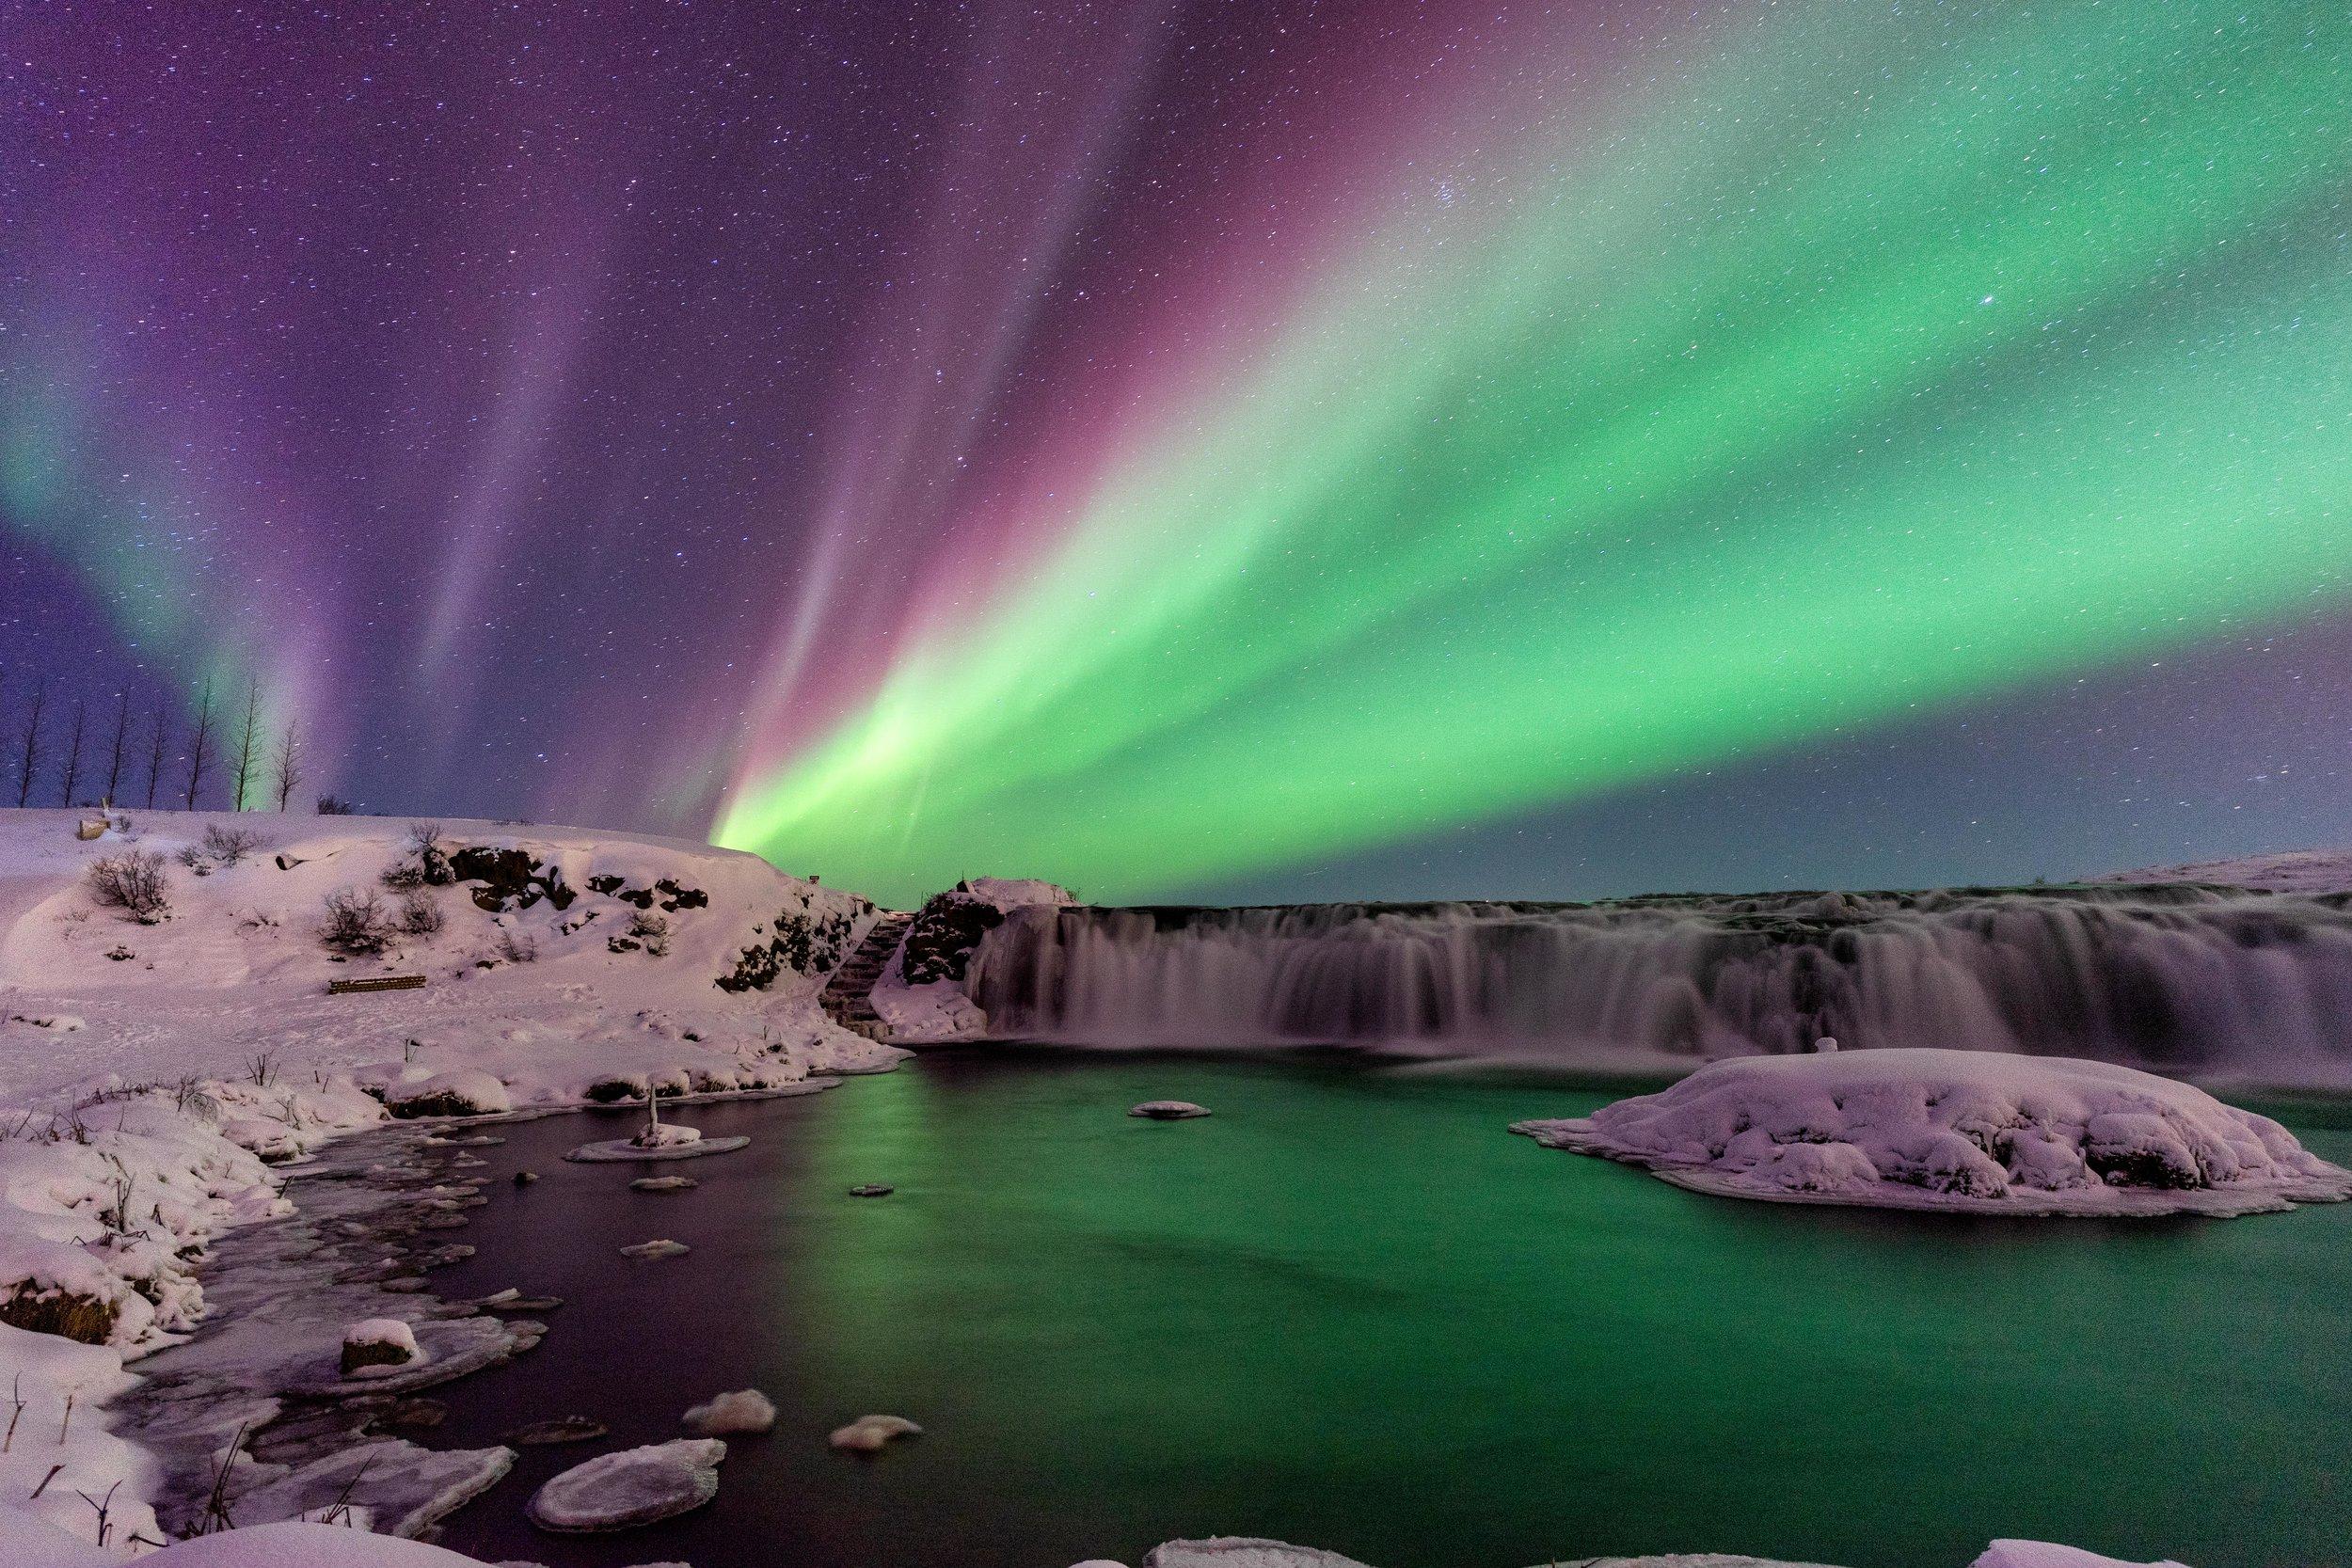 Iceland. snow. travel. adventure. photography. trip. epic landscape. snow. cold. freezing. sunrise. nothern lights..jpg